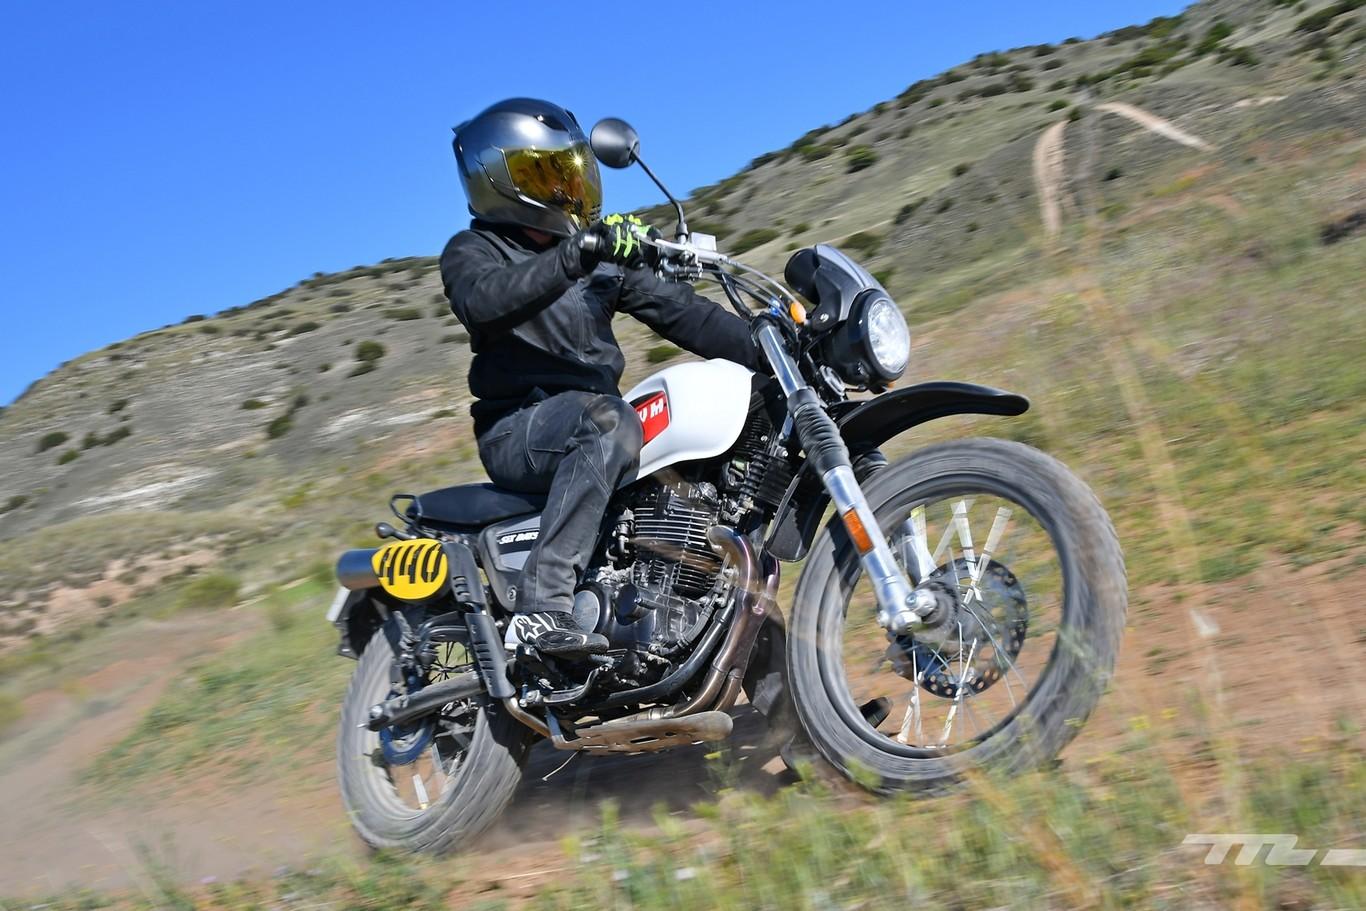 hight resolution of swm six days 440 2019 prueba moto trail pura para el carnet a2 sencilla y asequible